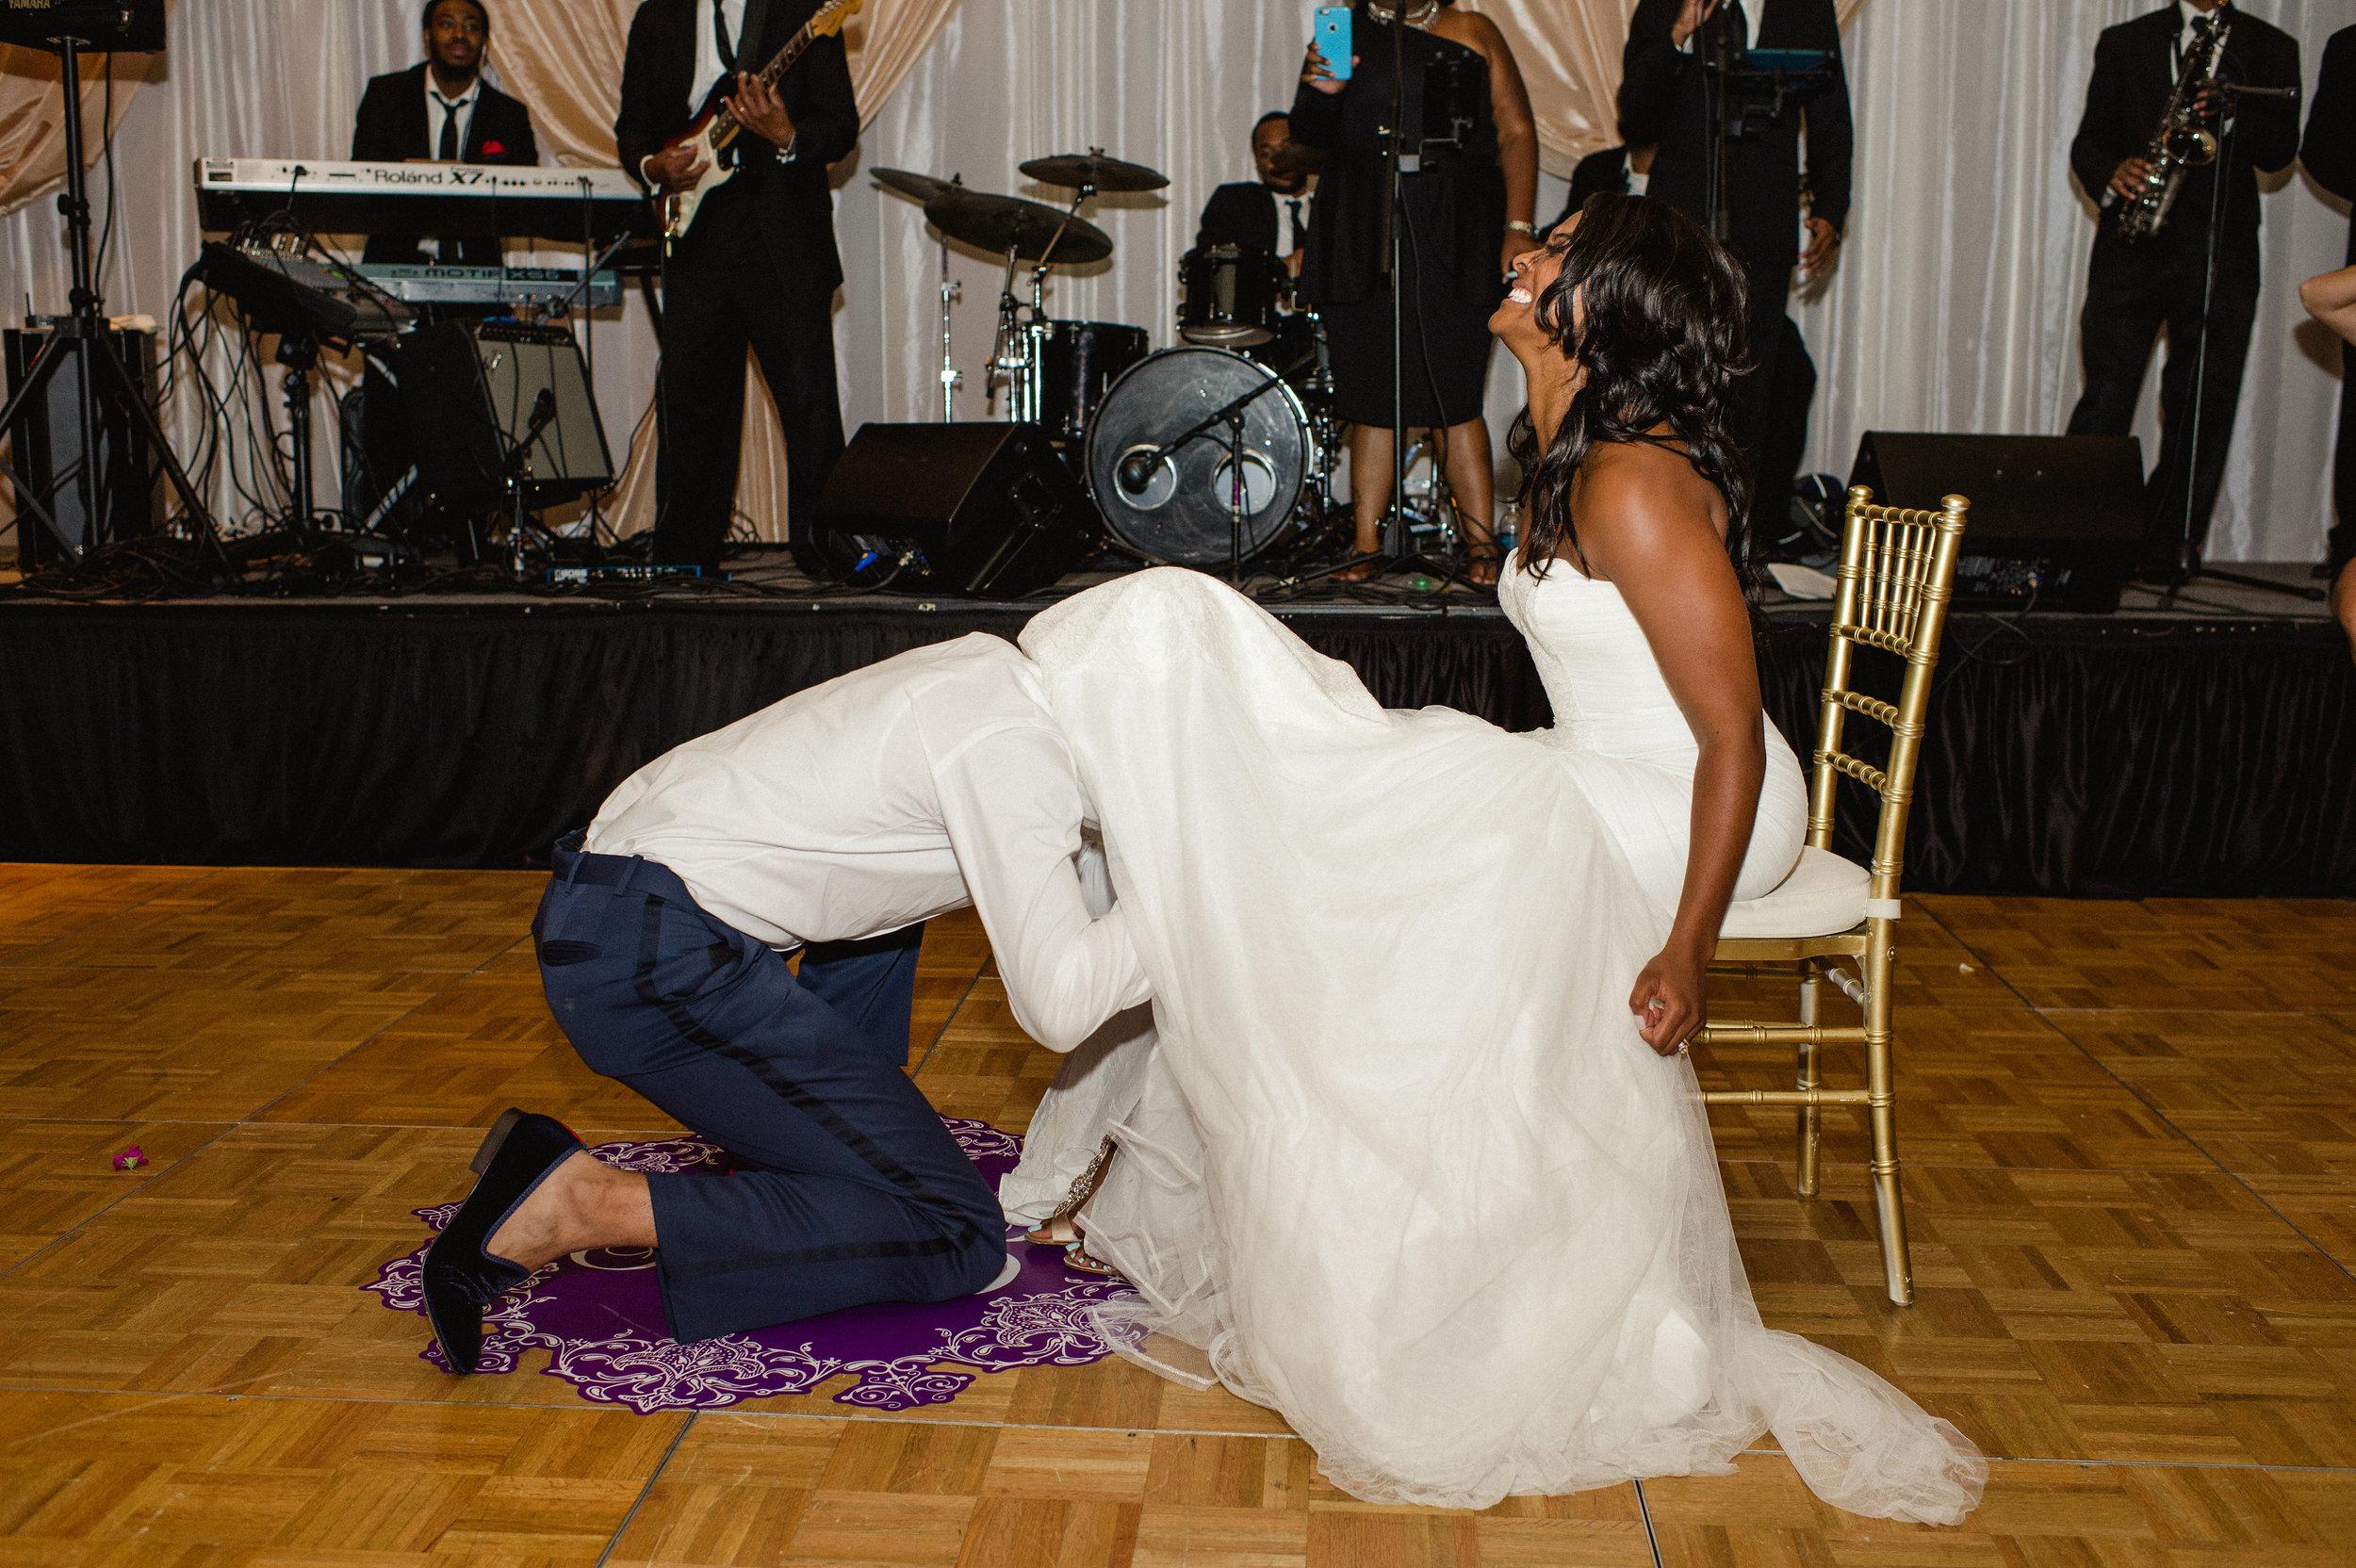 imani&chris|wedding|reception-372.jpg